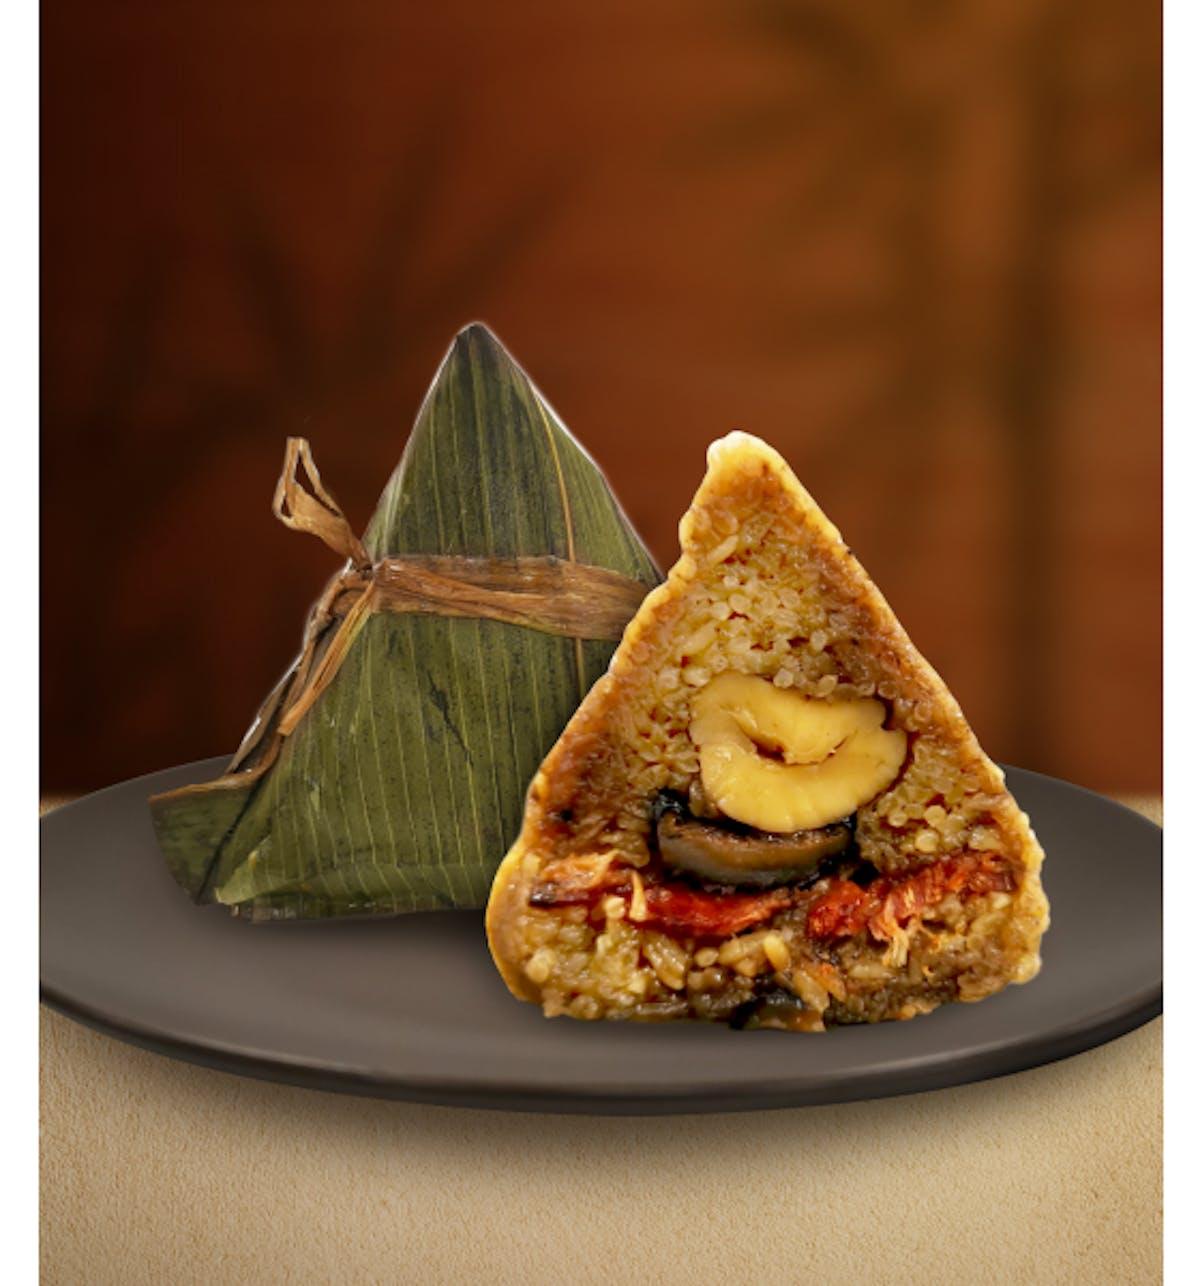 Gourmet Bak Kwa Rice Dumpling 经典肉干棕